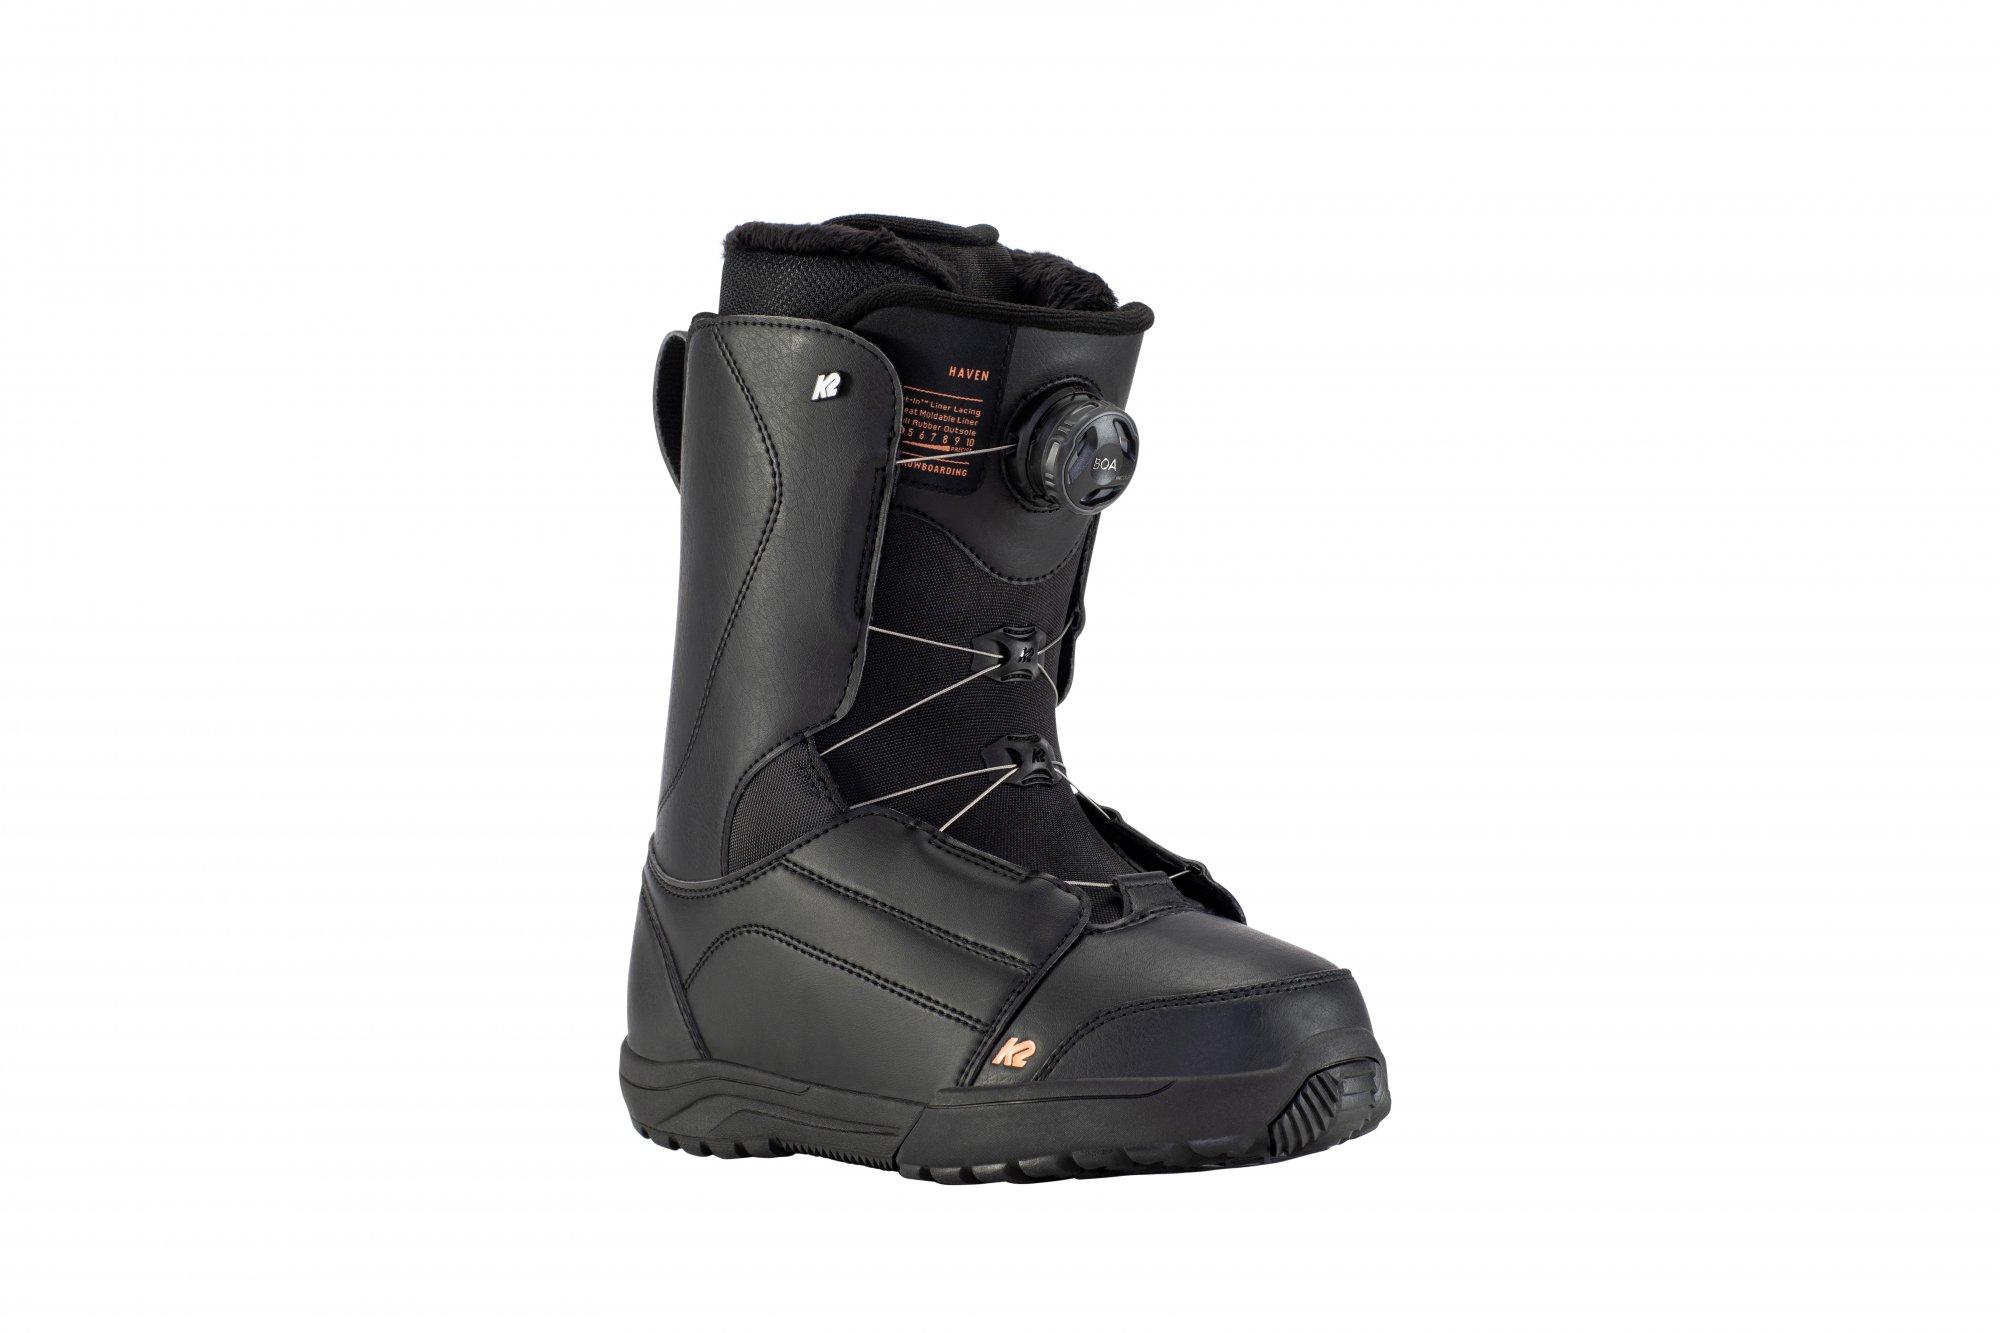 2021 K2 Haven Women's Snowboard Boots